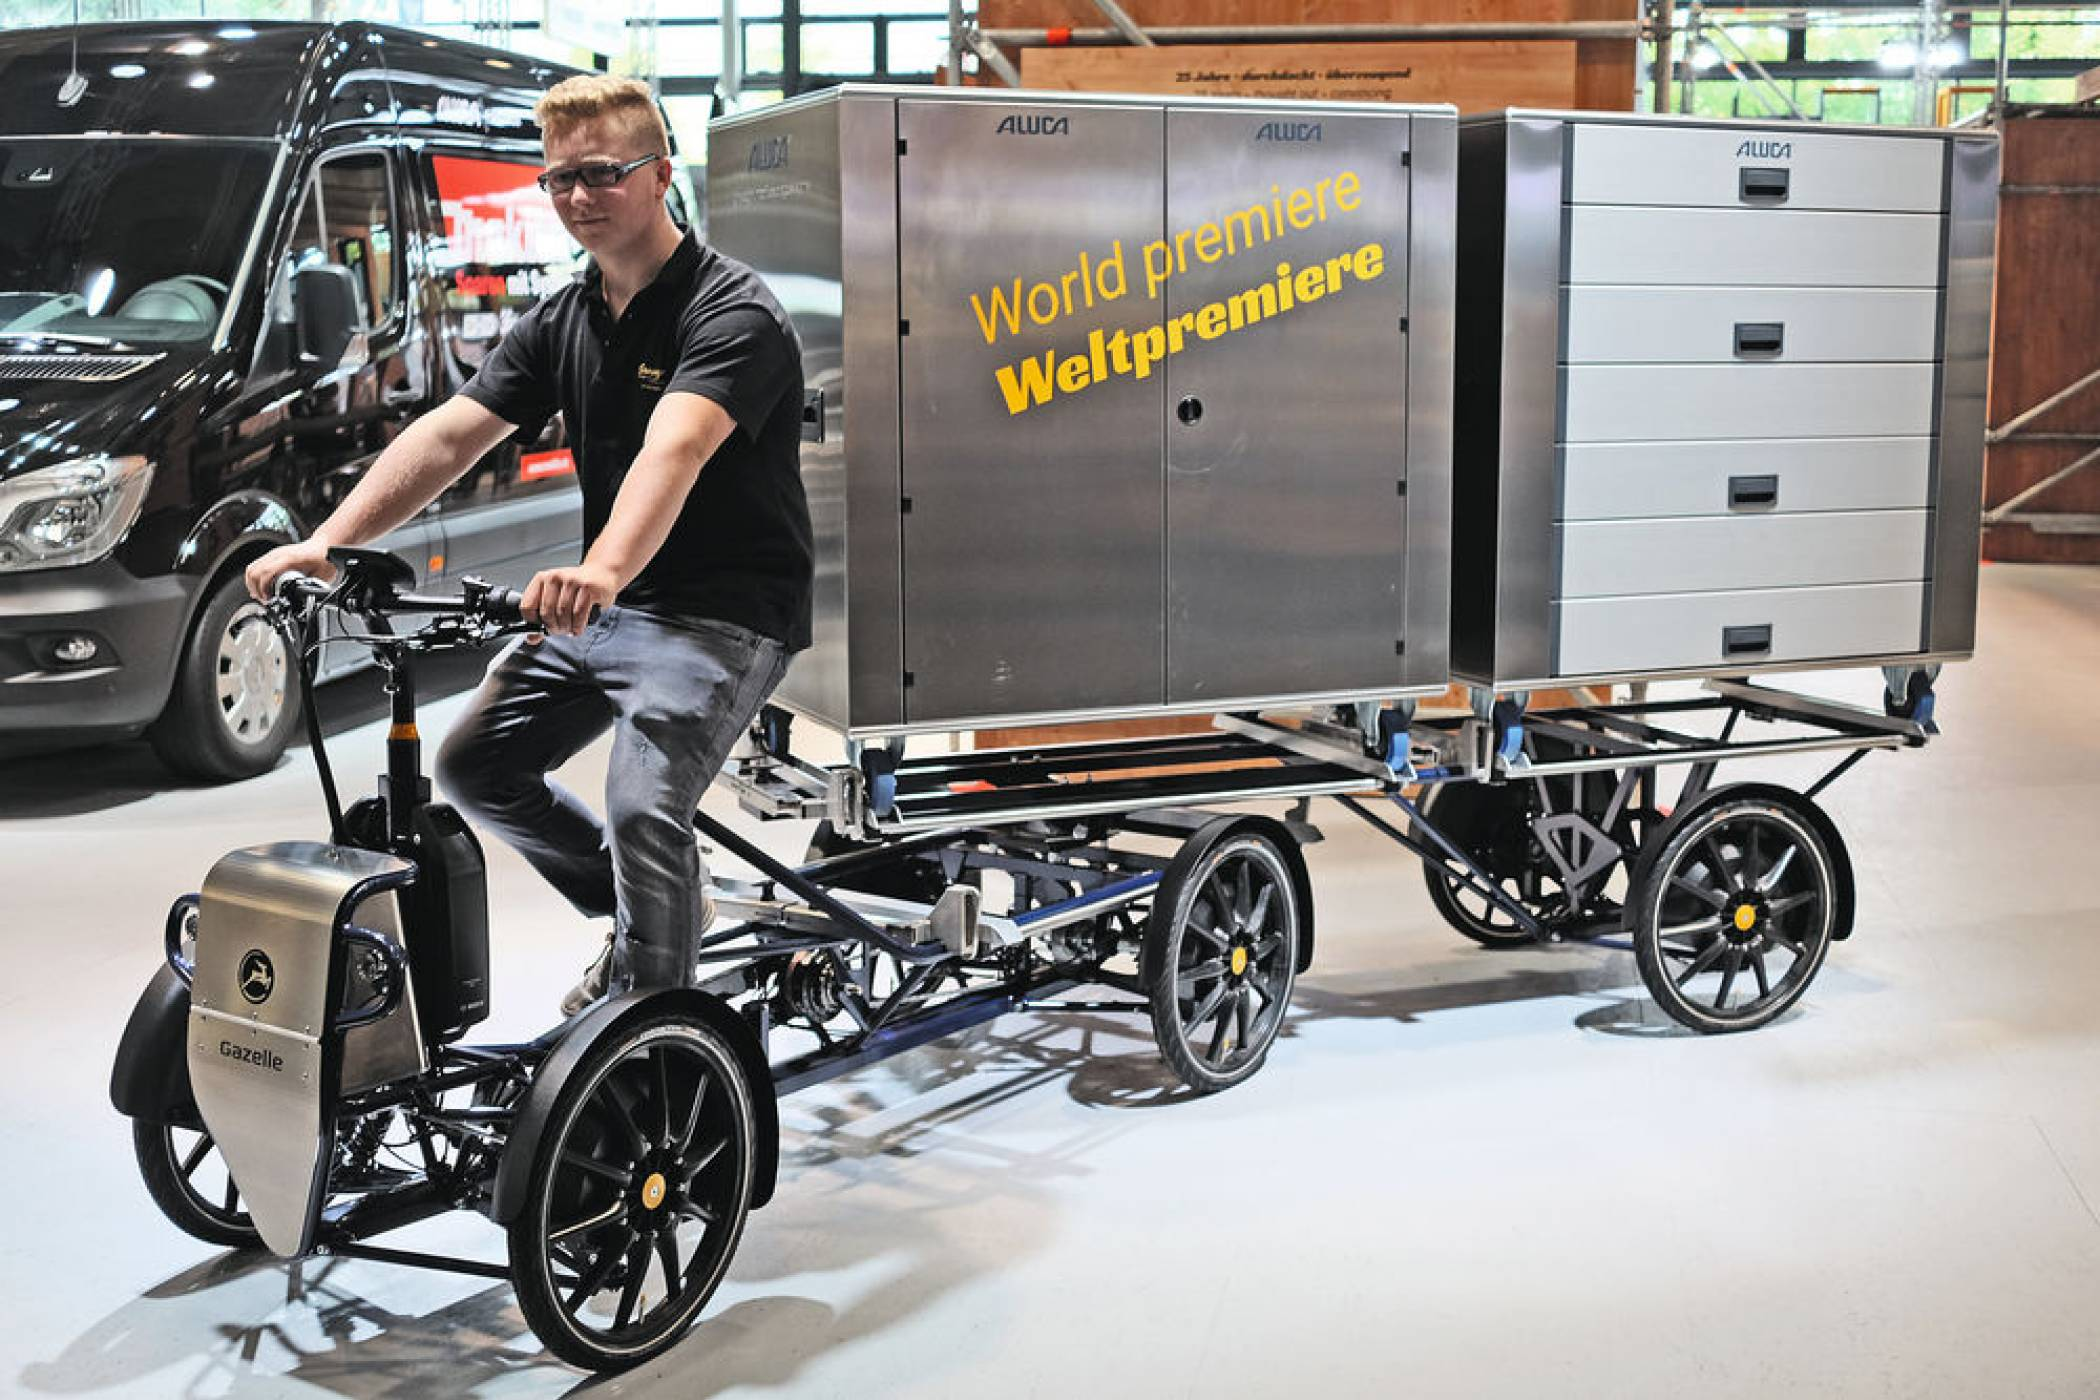 iaa2018 aluca ein e lastenrad als sattelzug rundgang. Black Bedroom Furniture Sets. Home Design Ideas